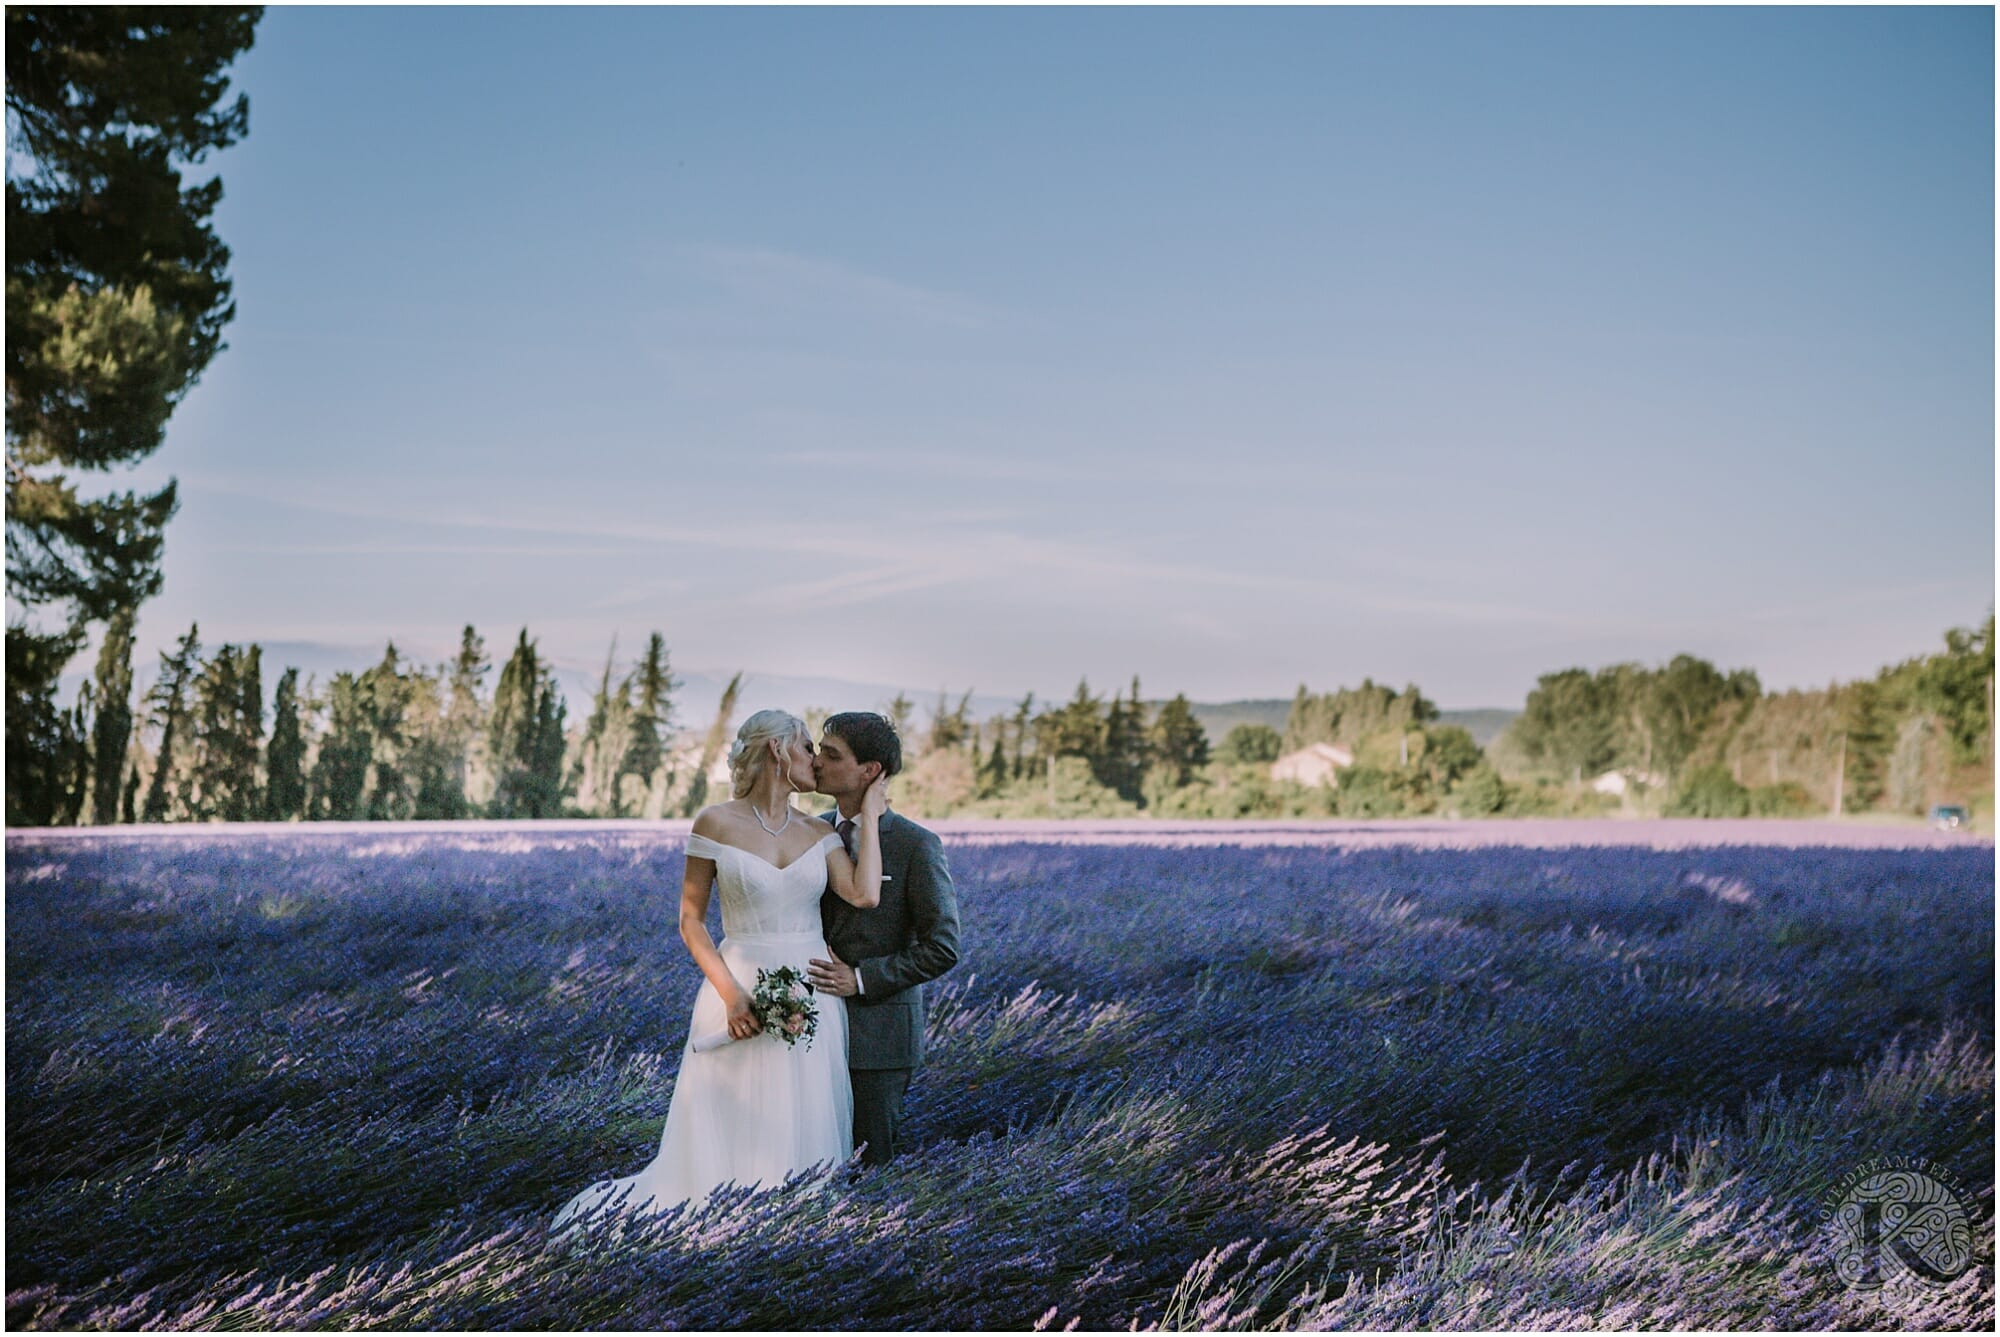 Kateryna-photos-photographe-mariage-chateau-des-3-fontaines-provence-avignon-vaucluse-sud_0088.jpg